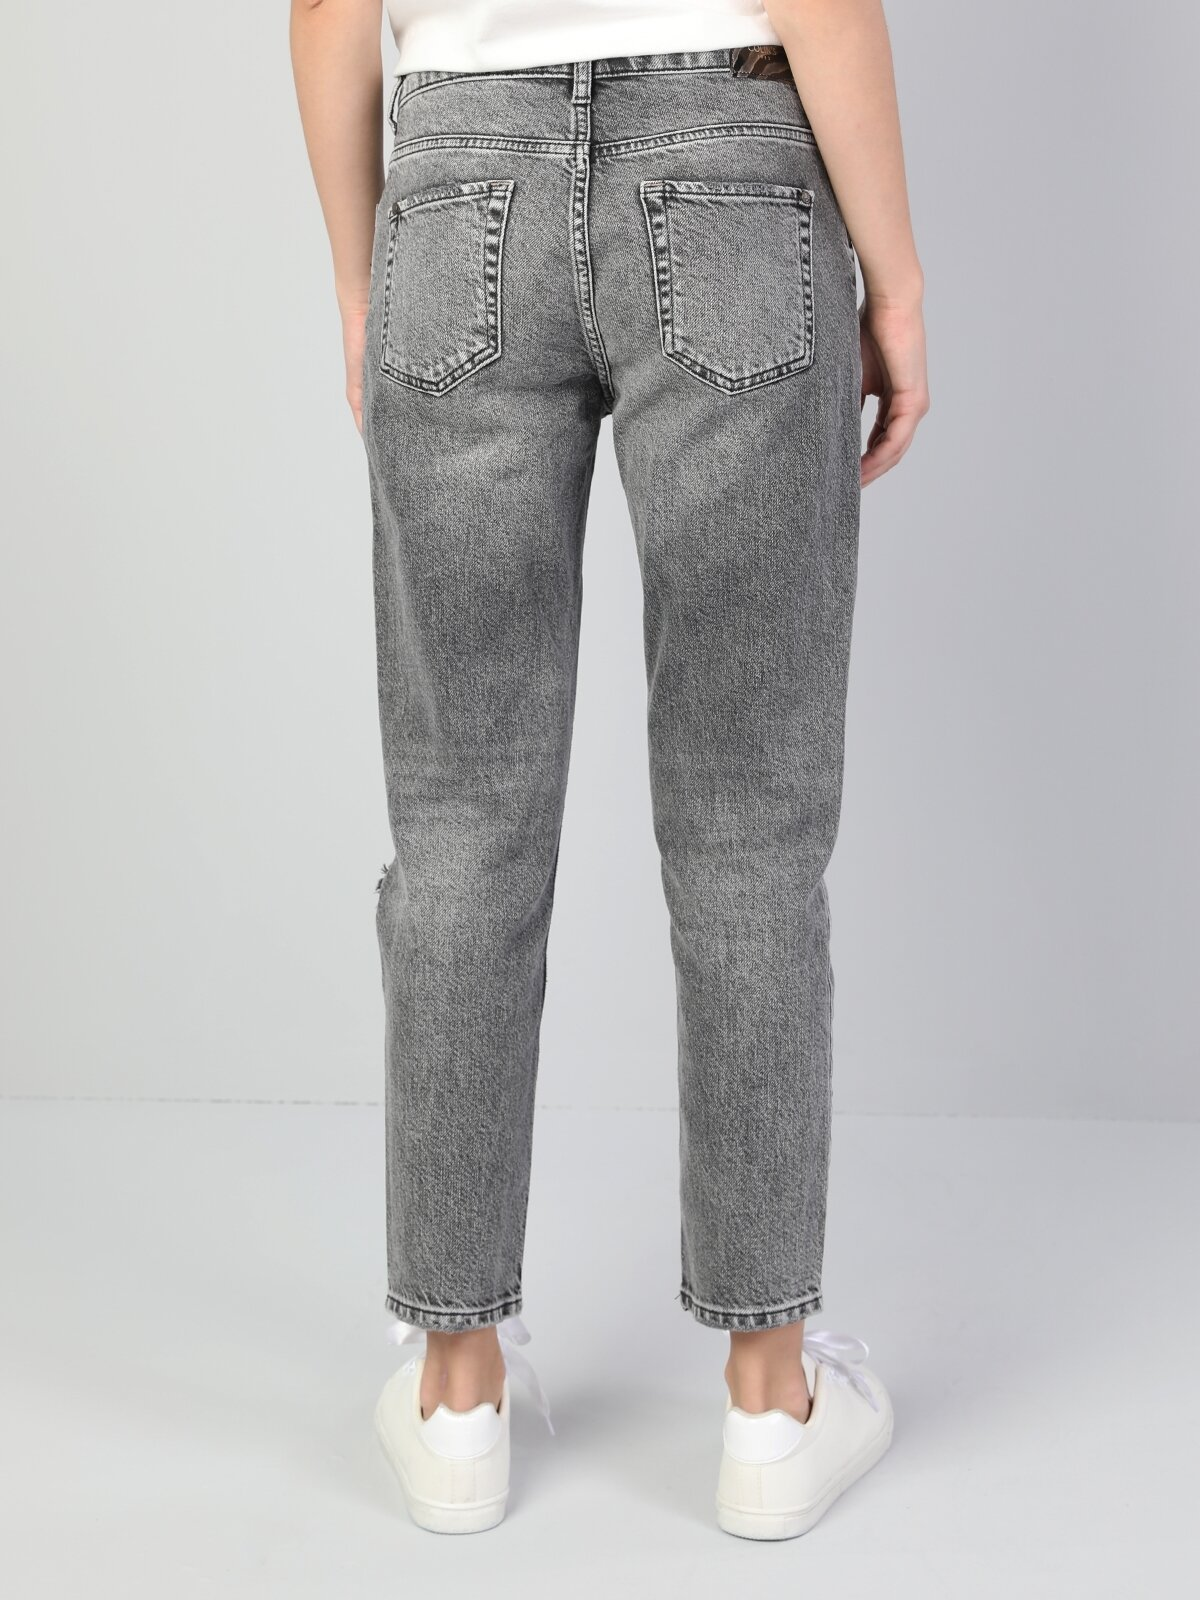 891 Maya Slim Fit Orta Bel Rahat Kesim Paça  Kadın Gri Jean Pantolon